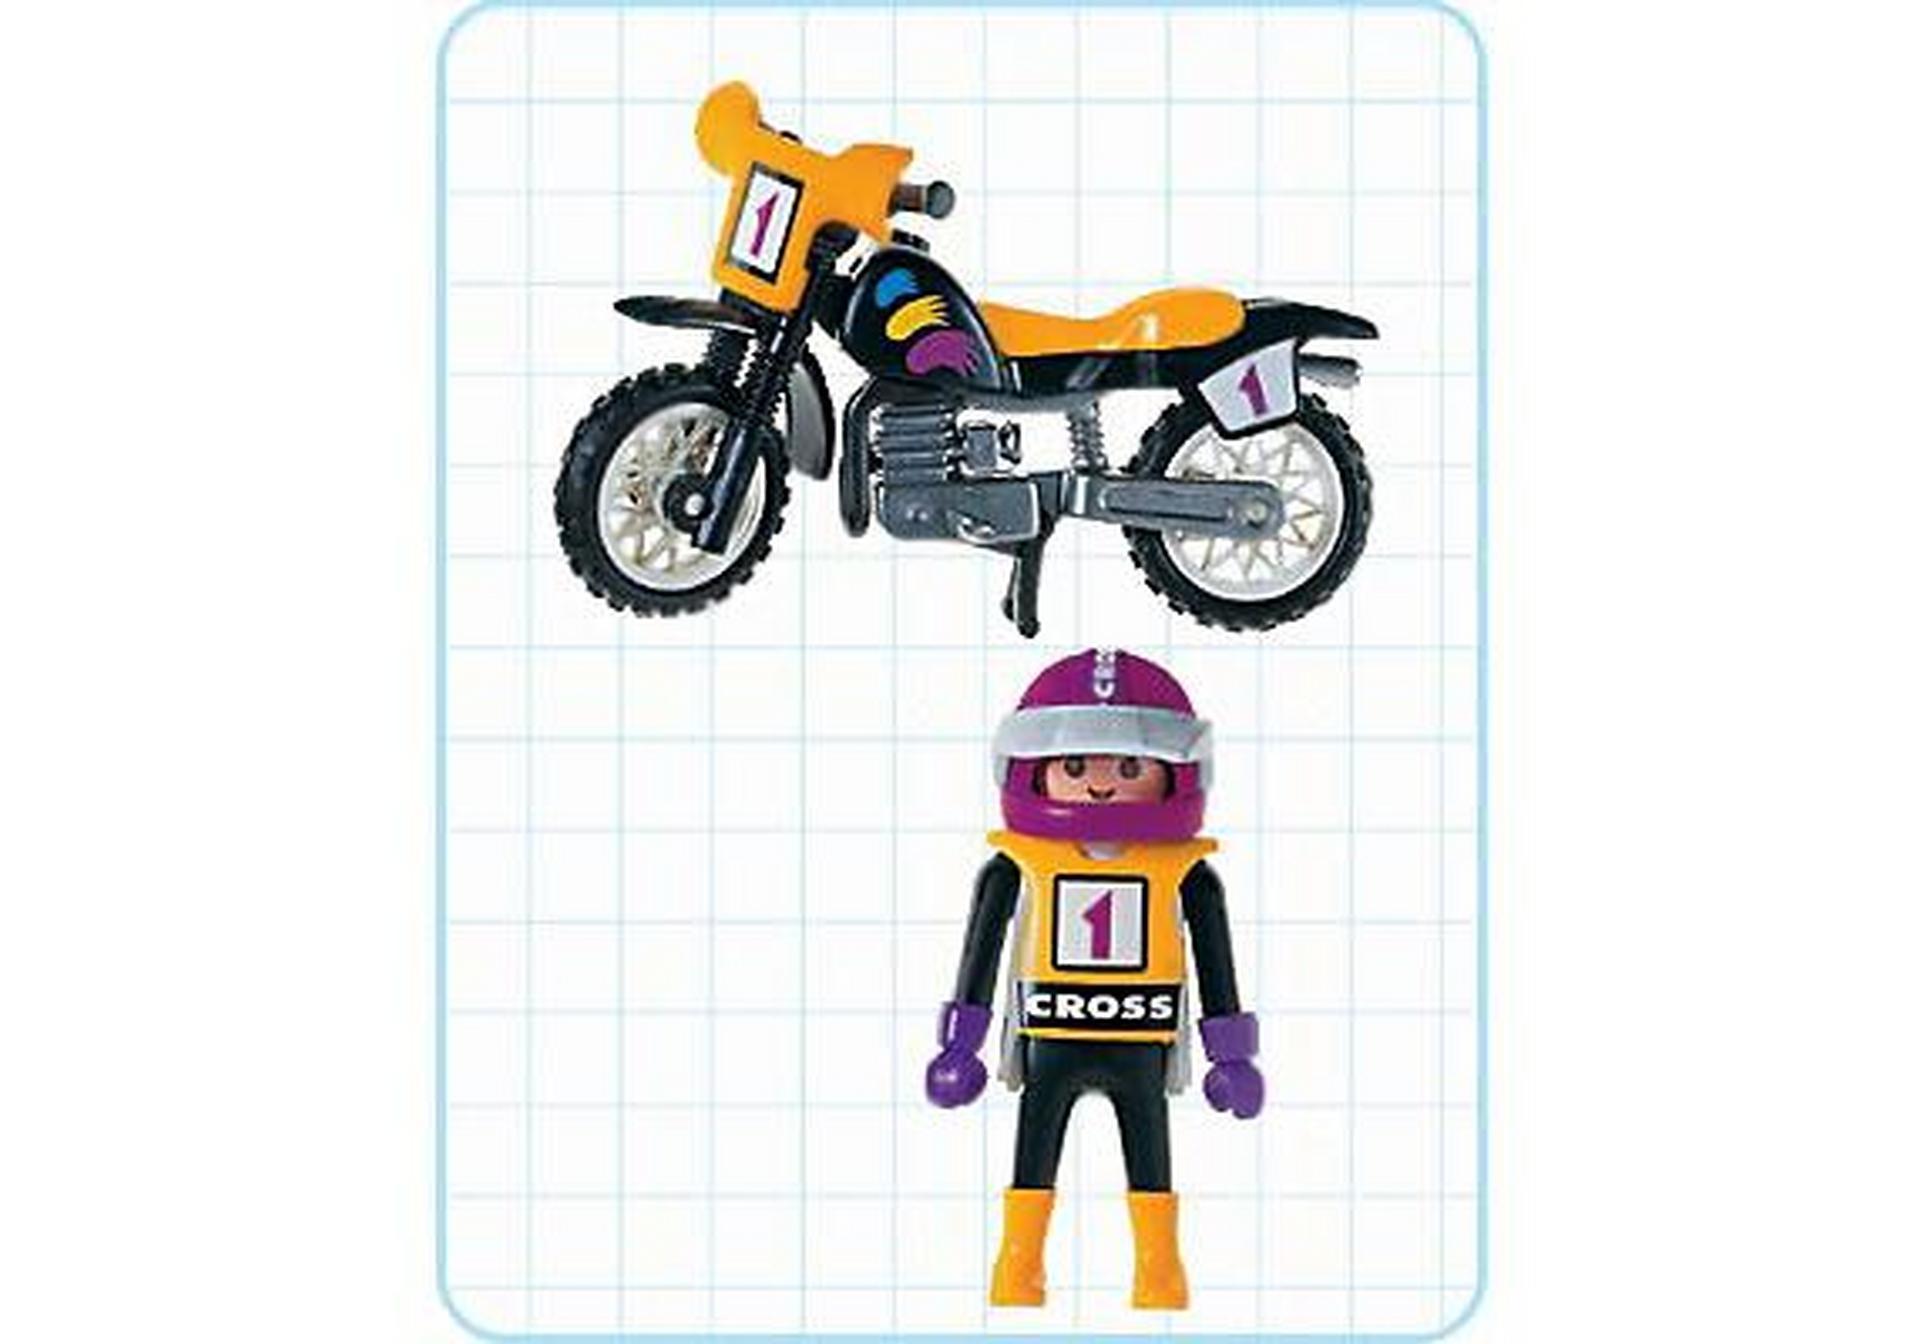 Pilote moto trial 3044 a playmobil france - Moto cross playmobil ...